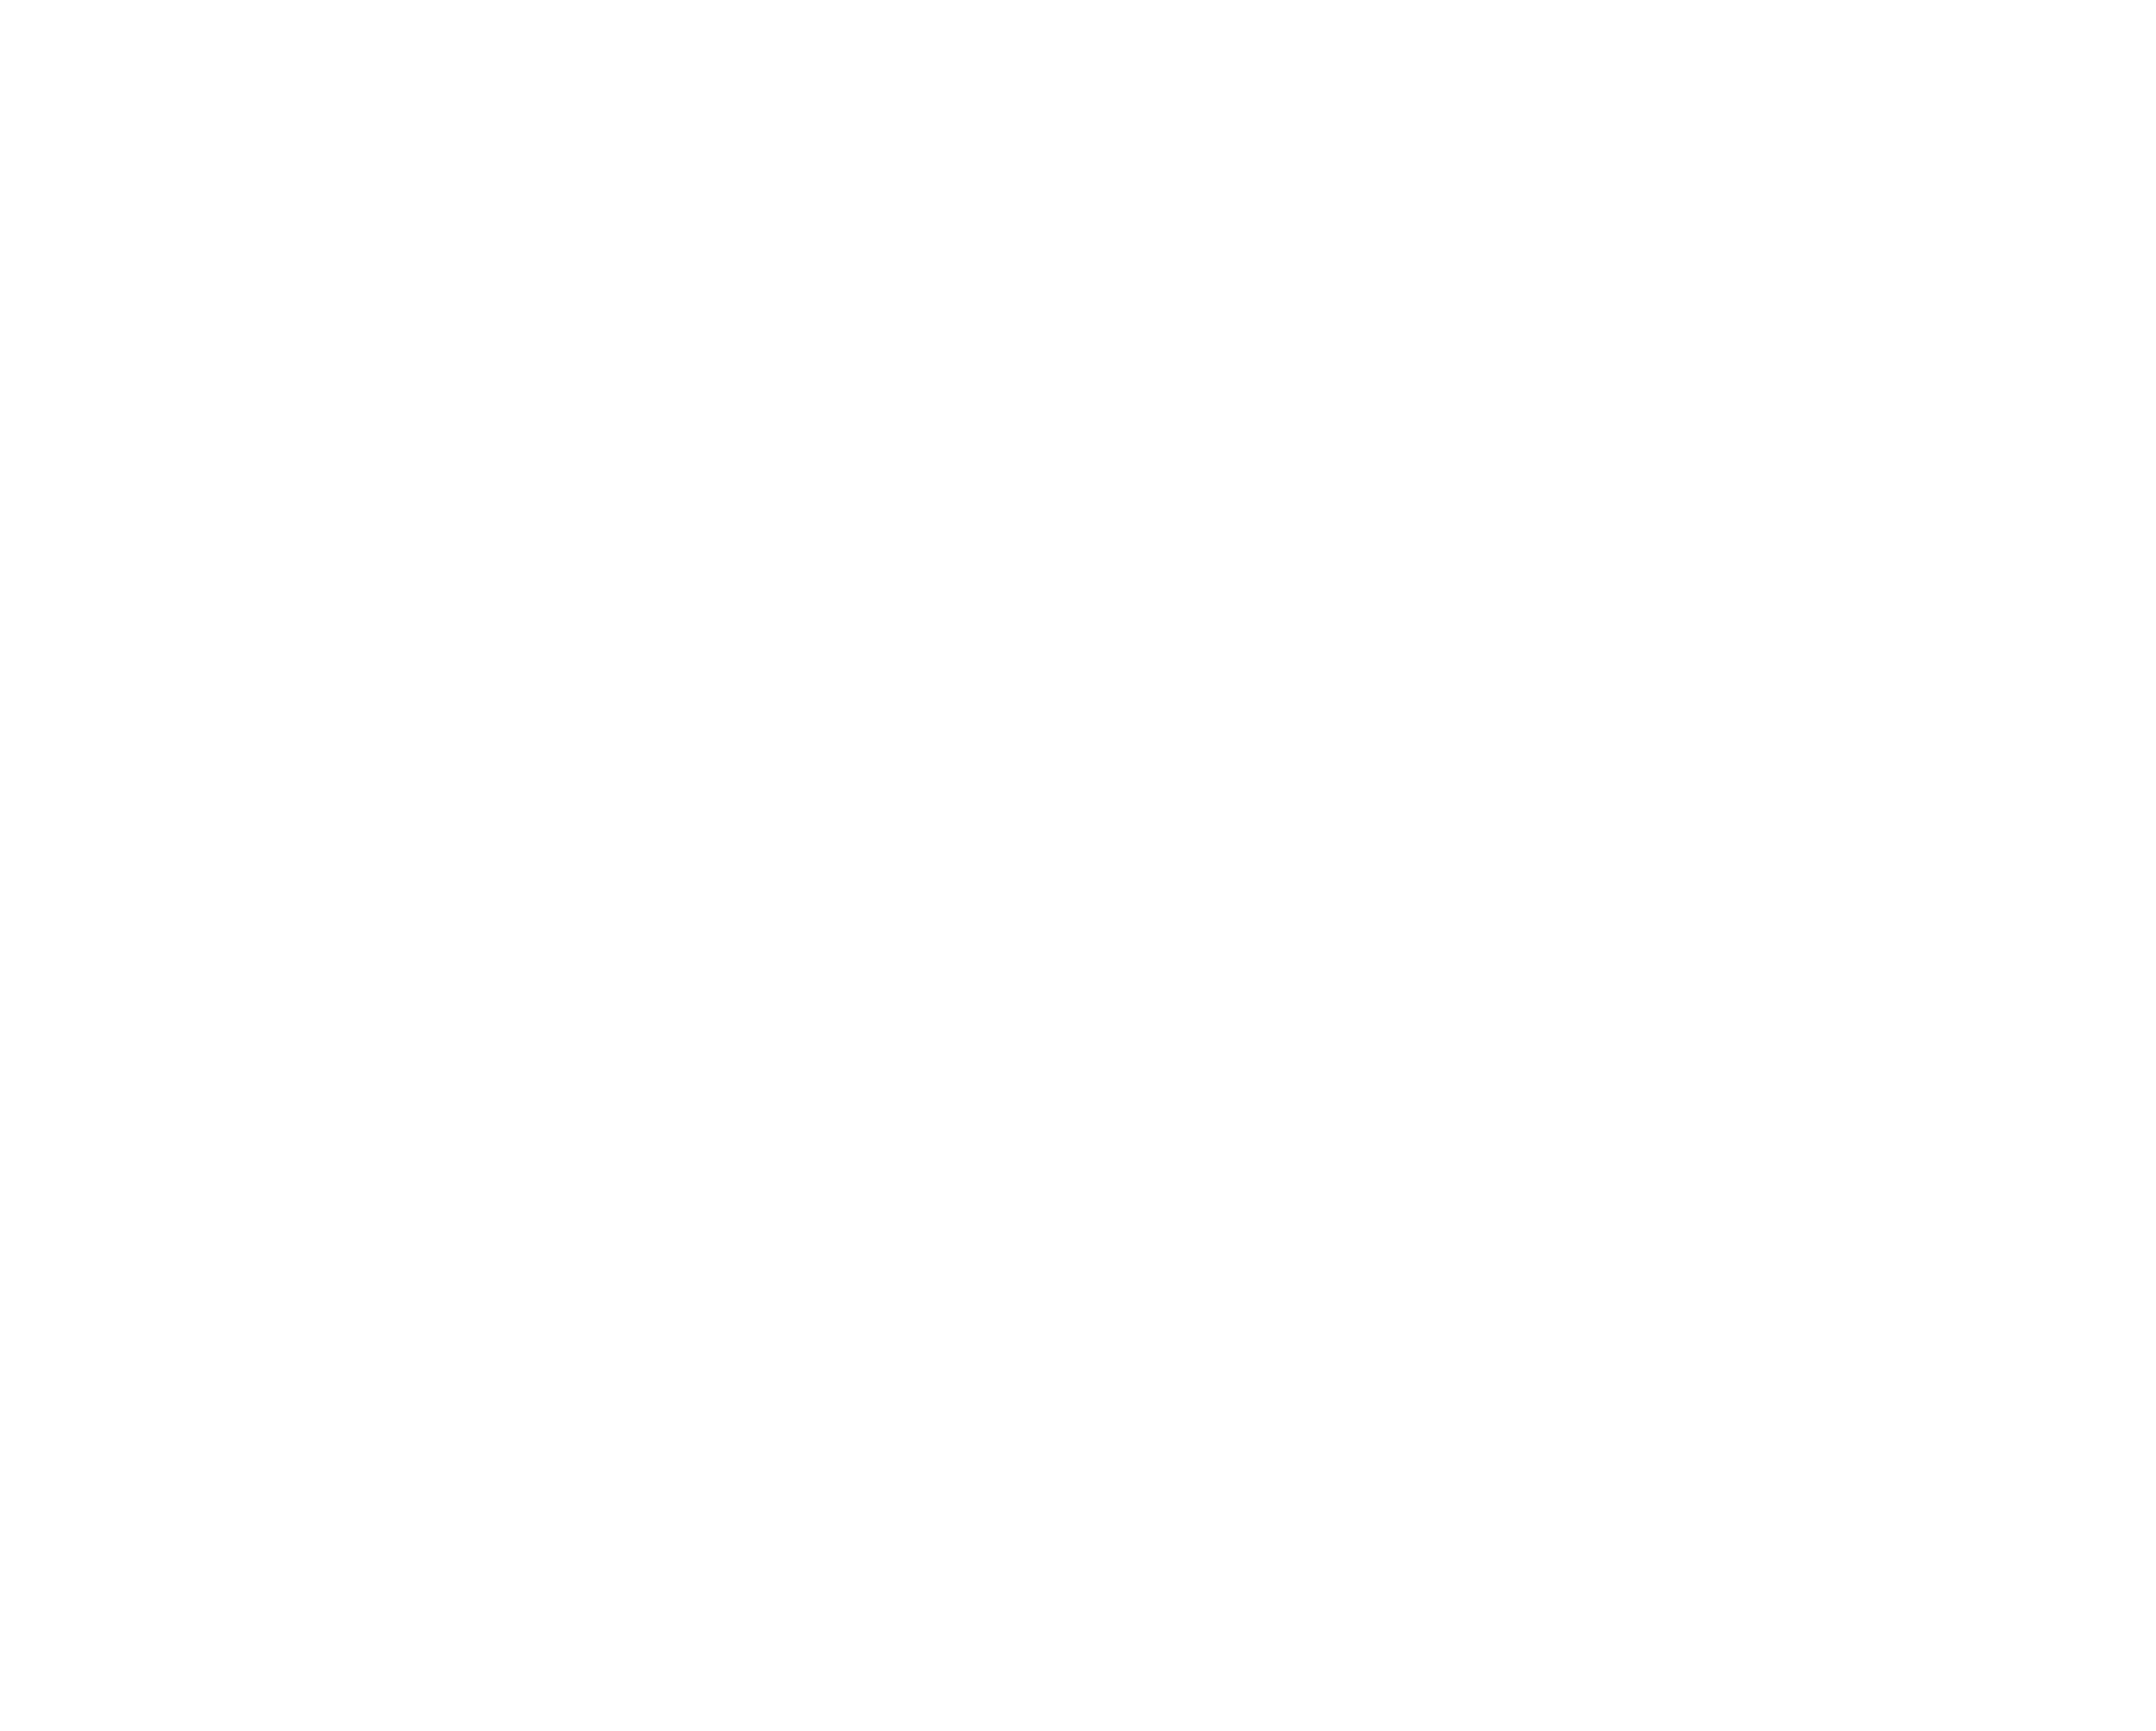 EE Green